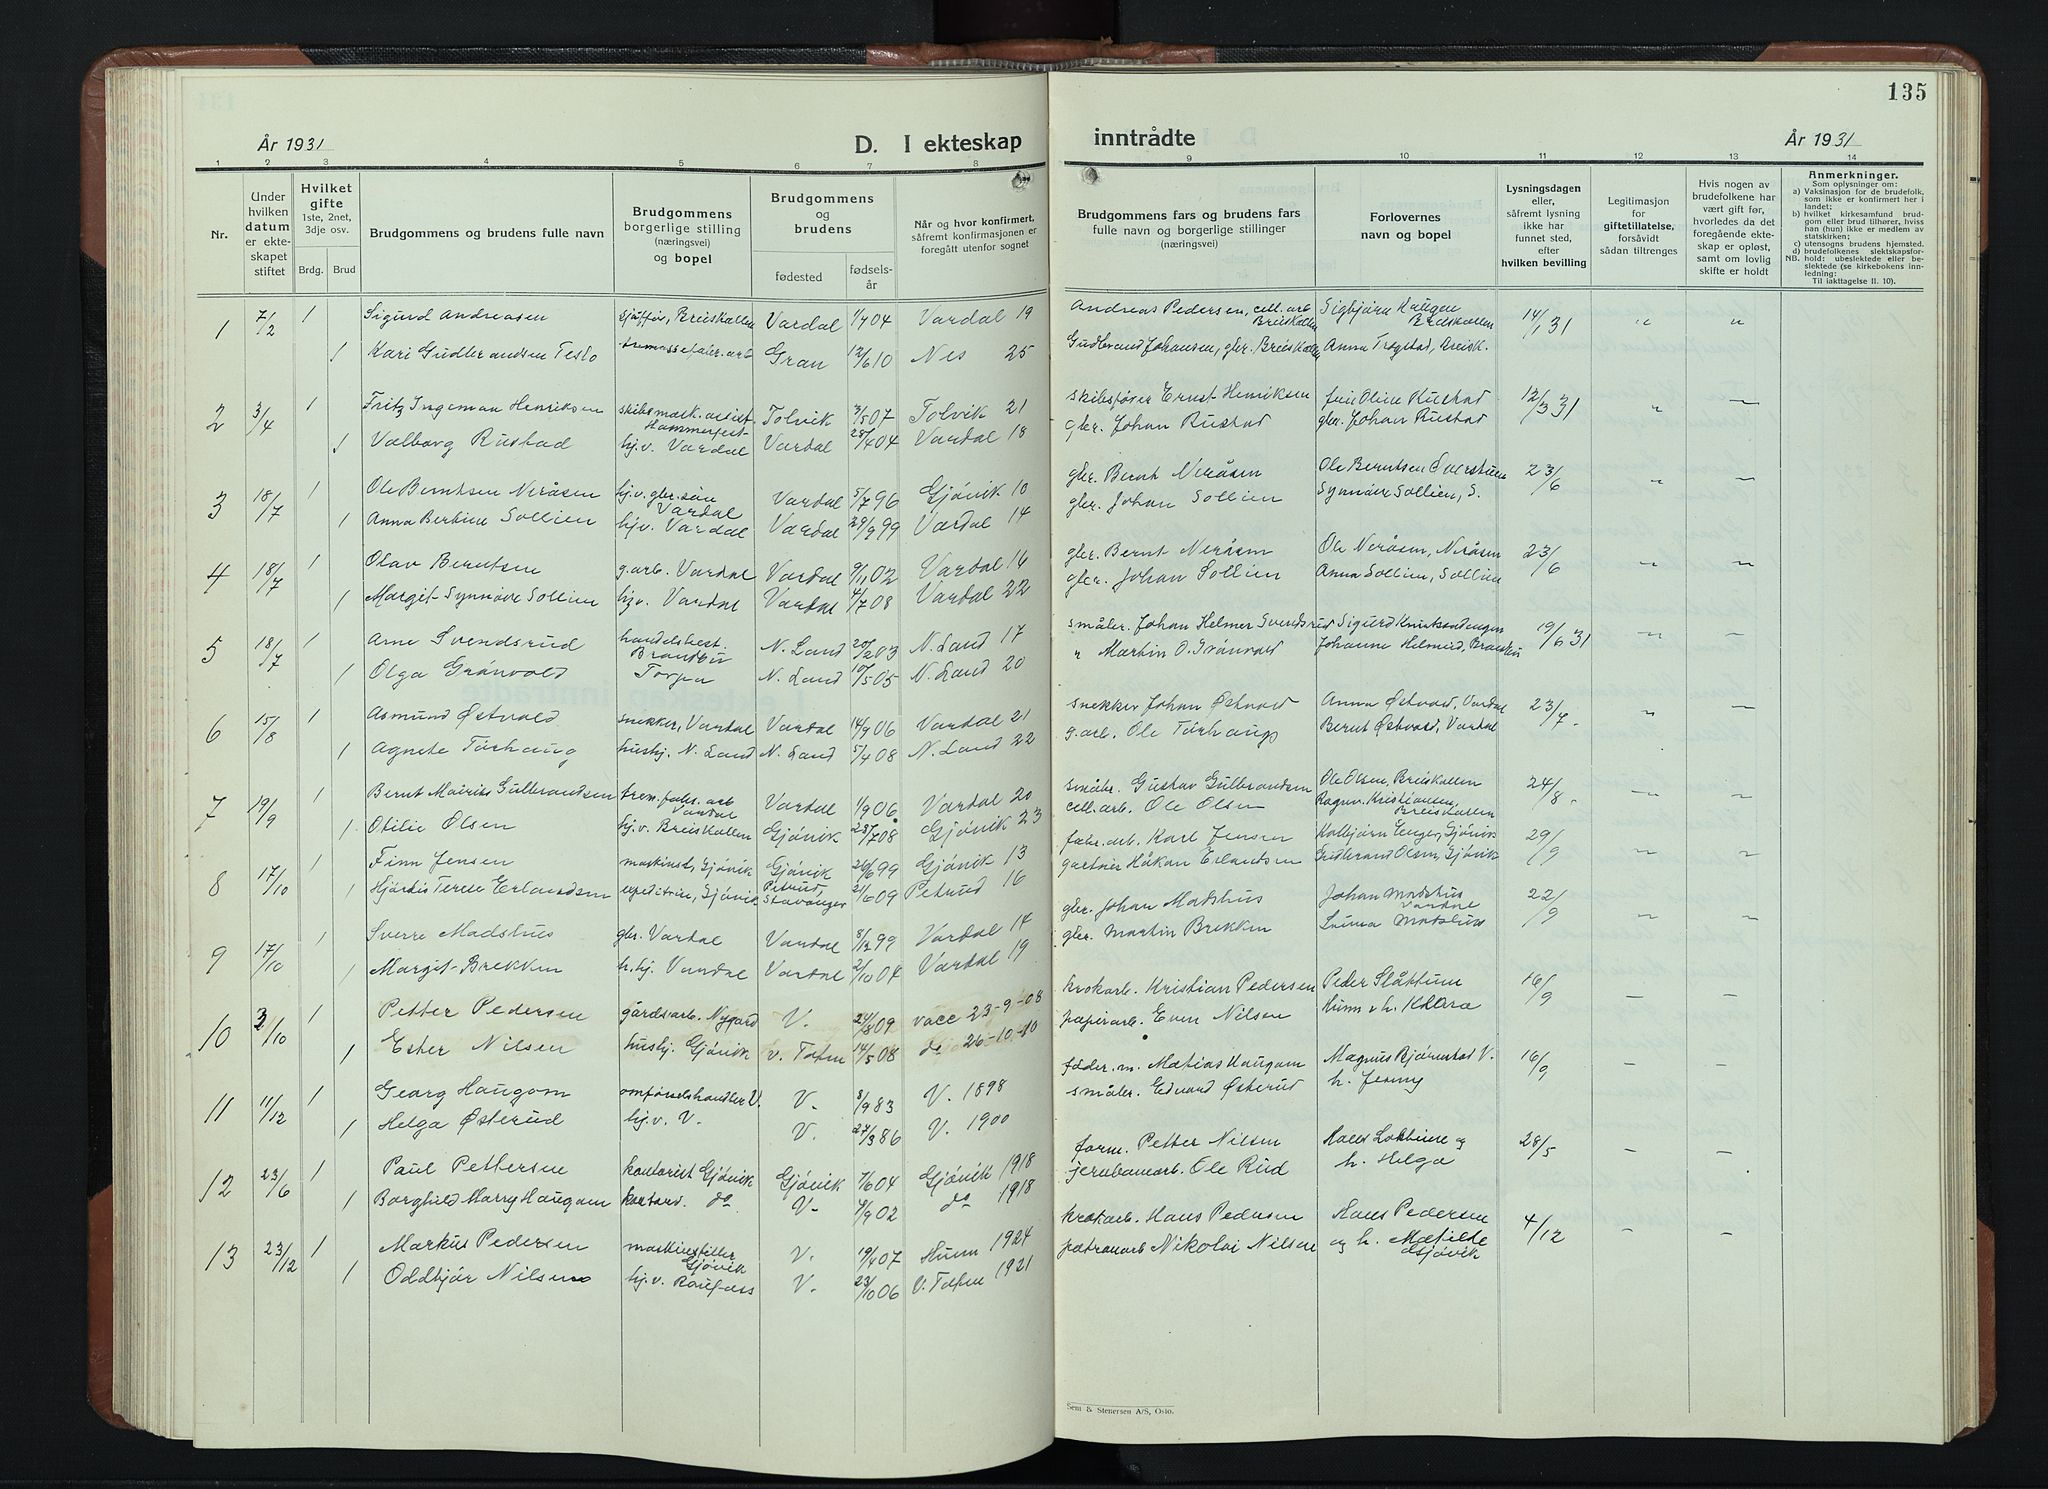 SAH, Vardal prestekontor, H/Ha/Hab/L0018: Klokkerbok nr. 18, 1931-1951, s. 135